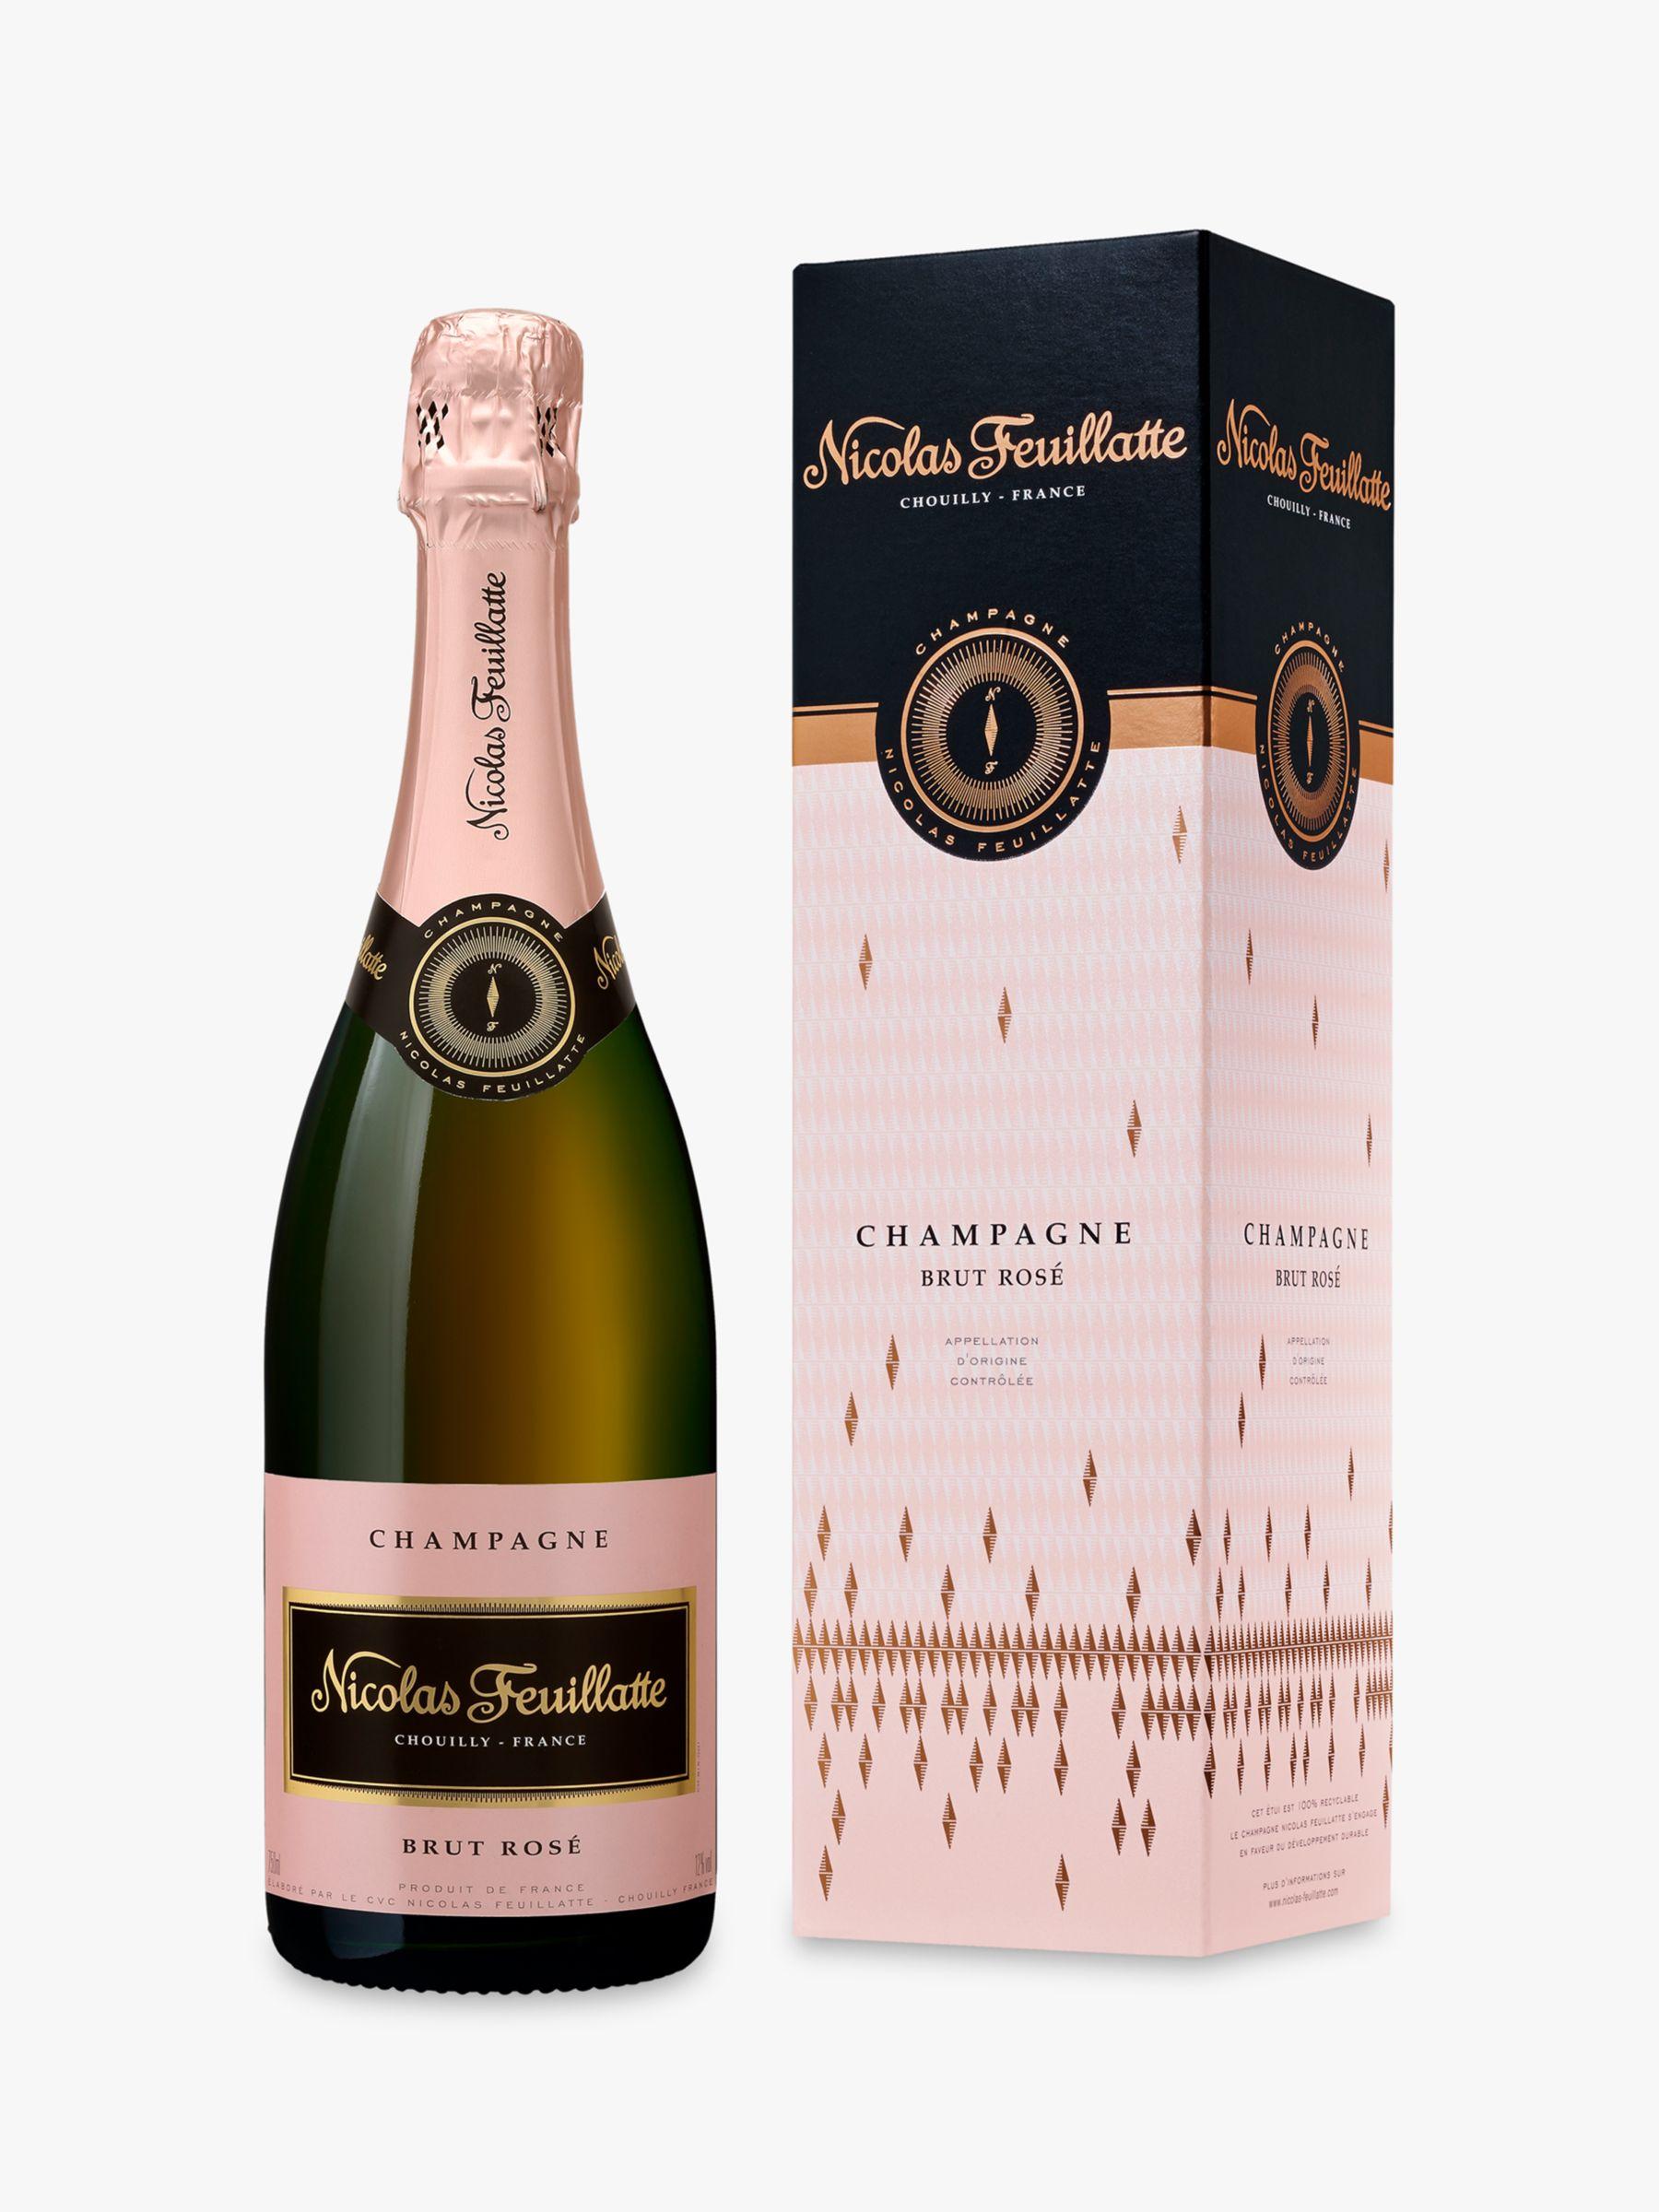 Nicolas Feuillatte Nicolas Feuillatte Brut Rosé Champagne, 75cl